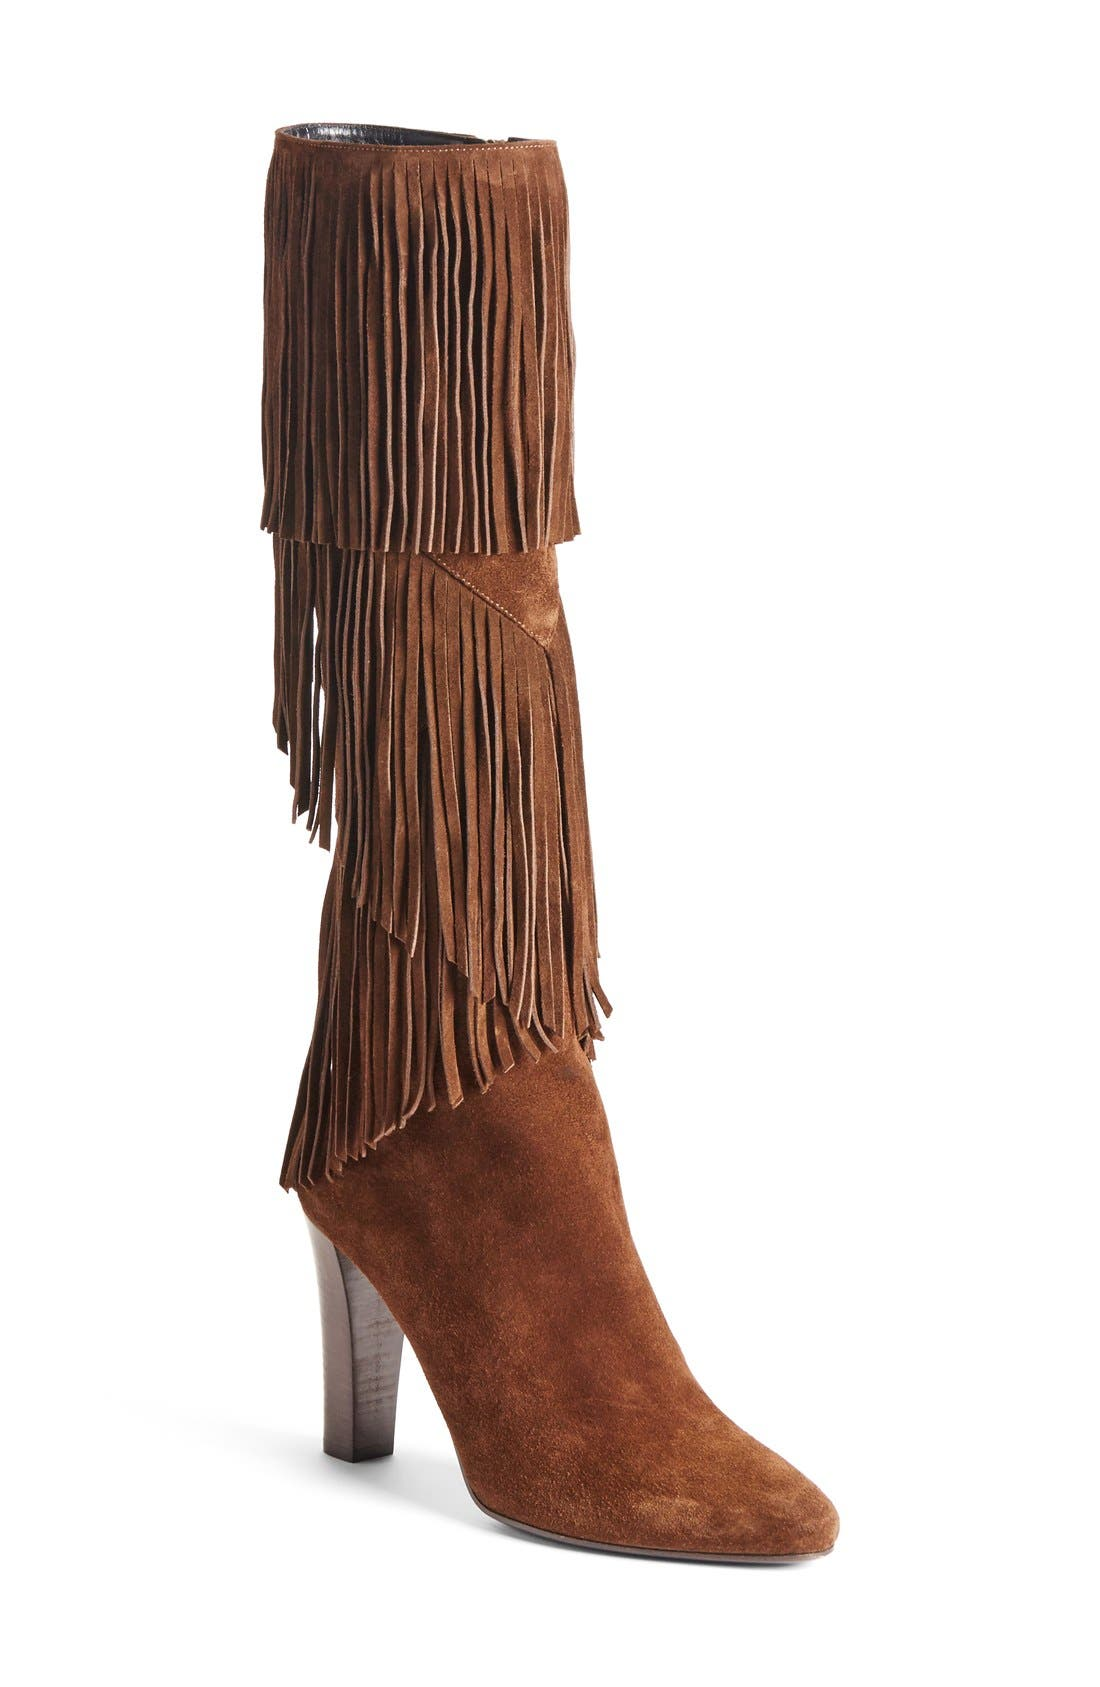 Alternate Image 1 Selected - Saint Laurent 'Lily' Fringe Tall Boot (Women)